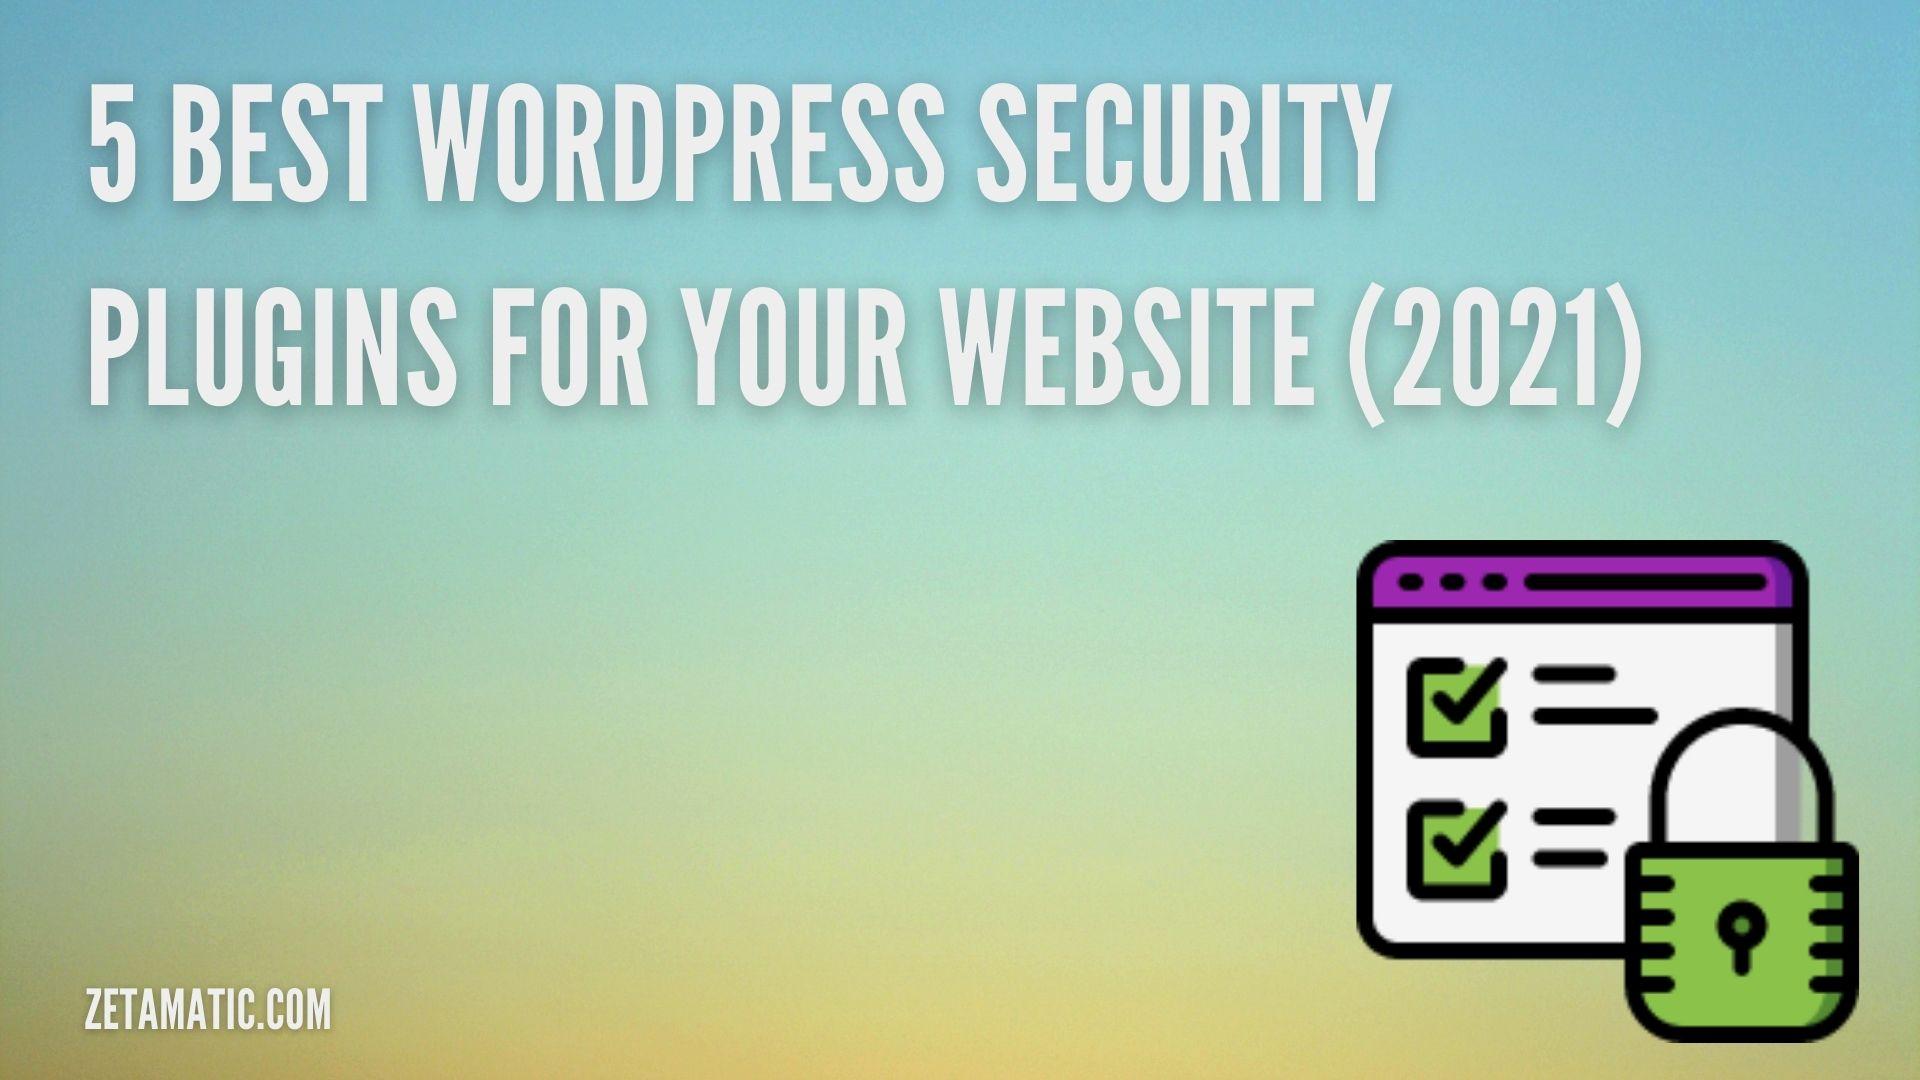 5 Best WordPress Security Plugins for Your Website (2021)